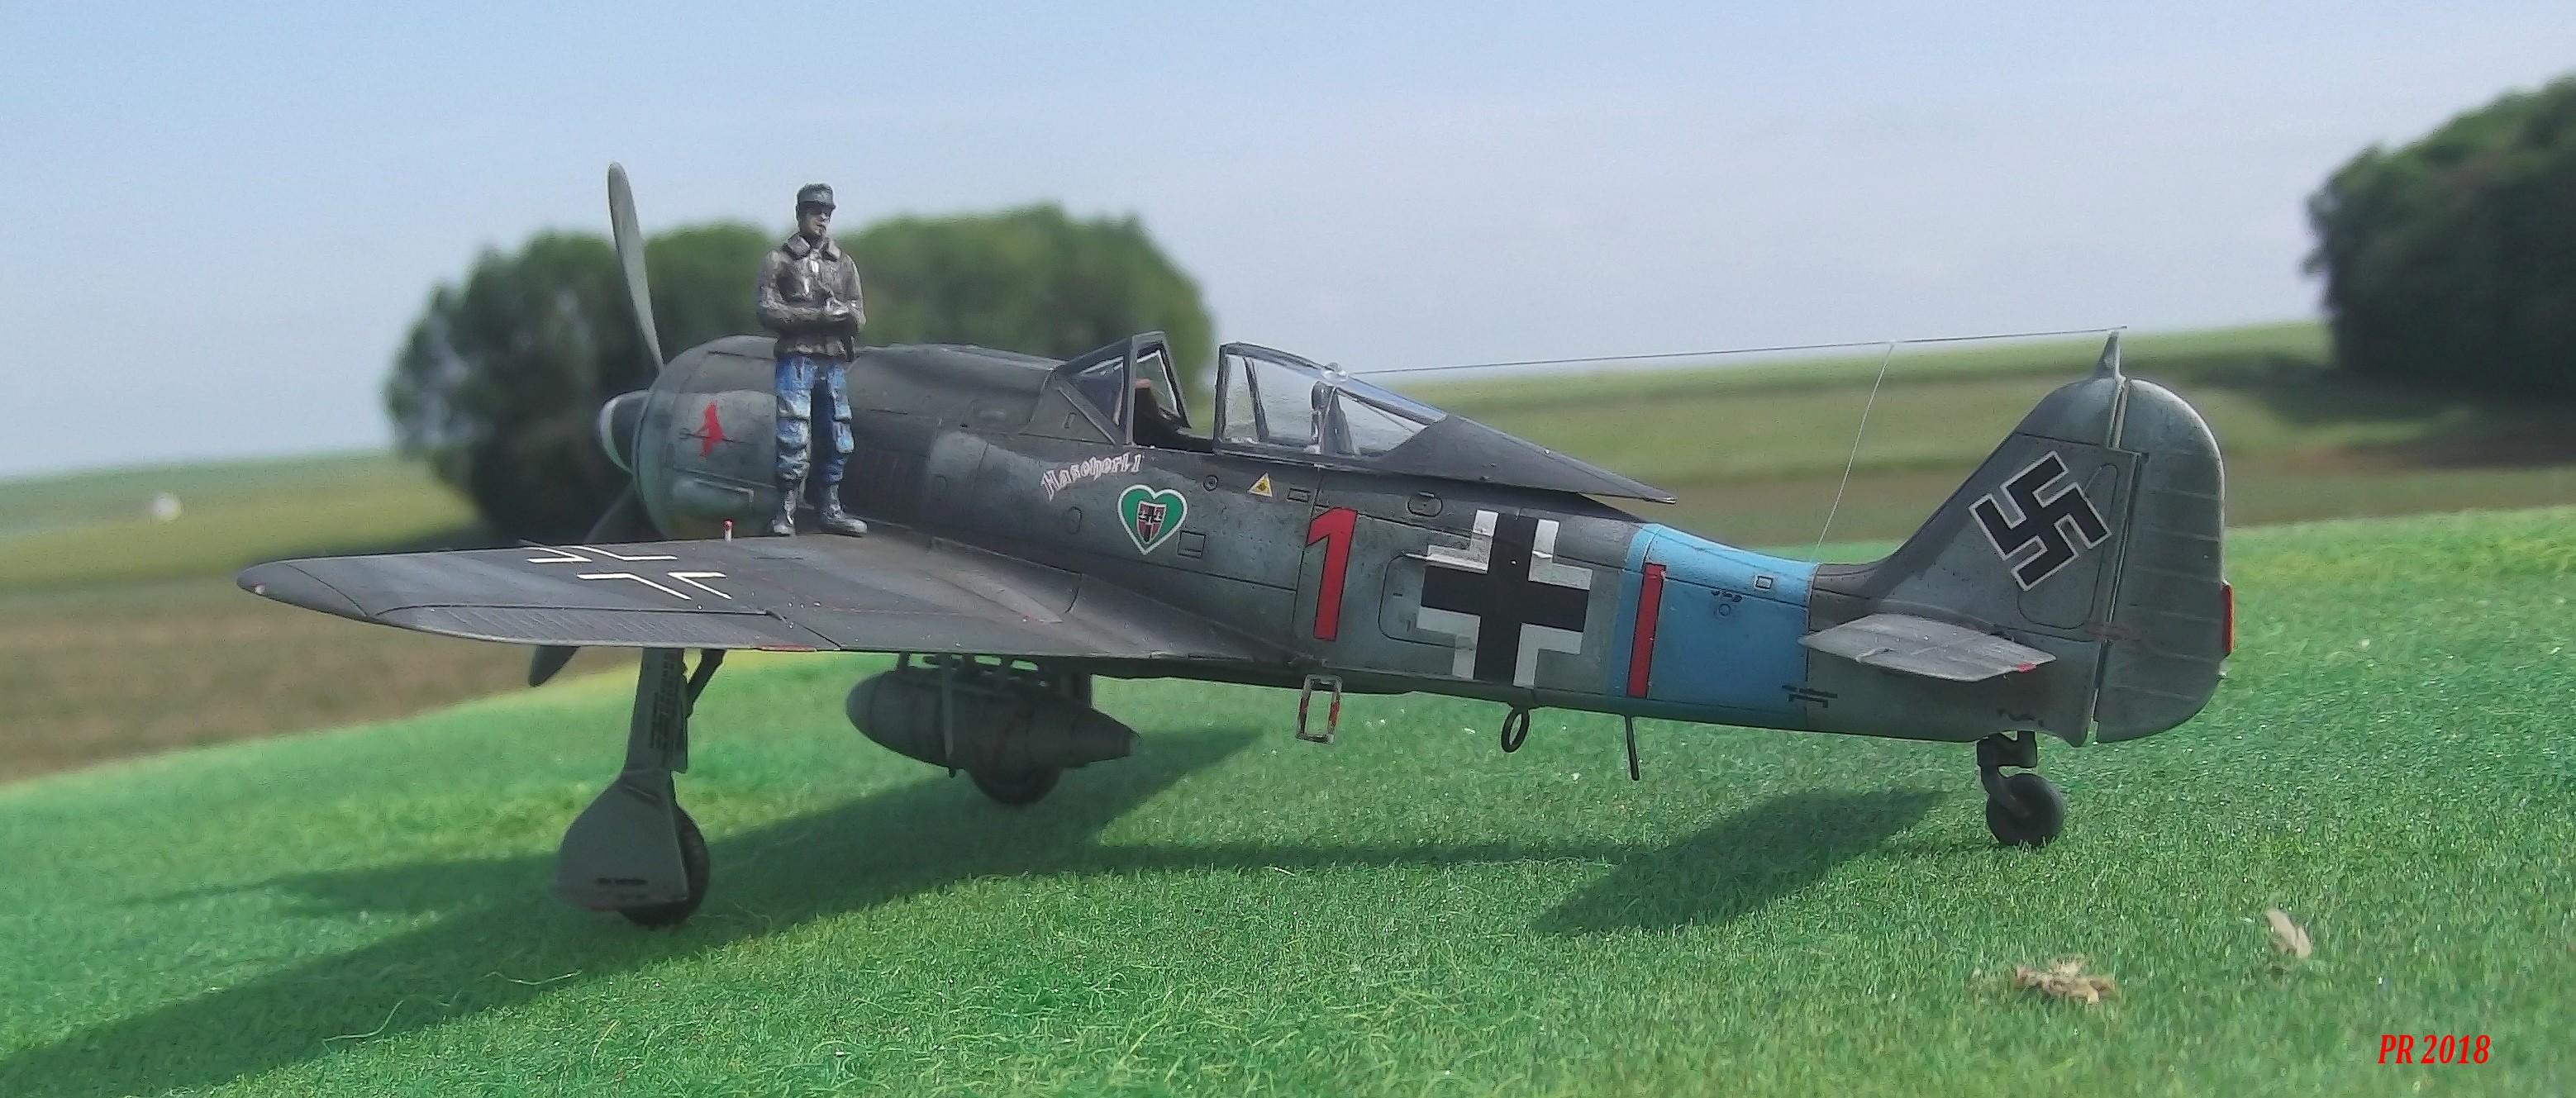 FW190 A8 maquette Eduard 1/72 Ab0110